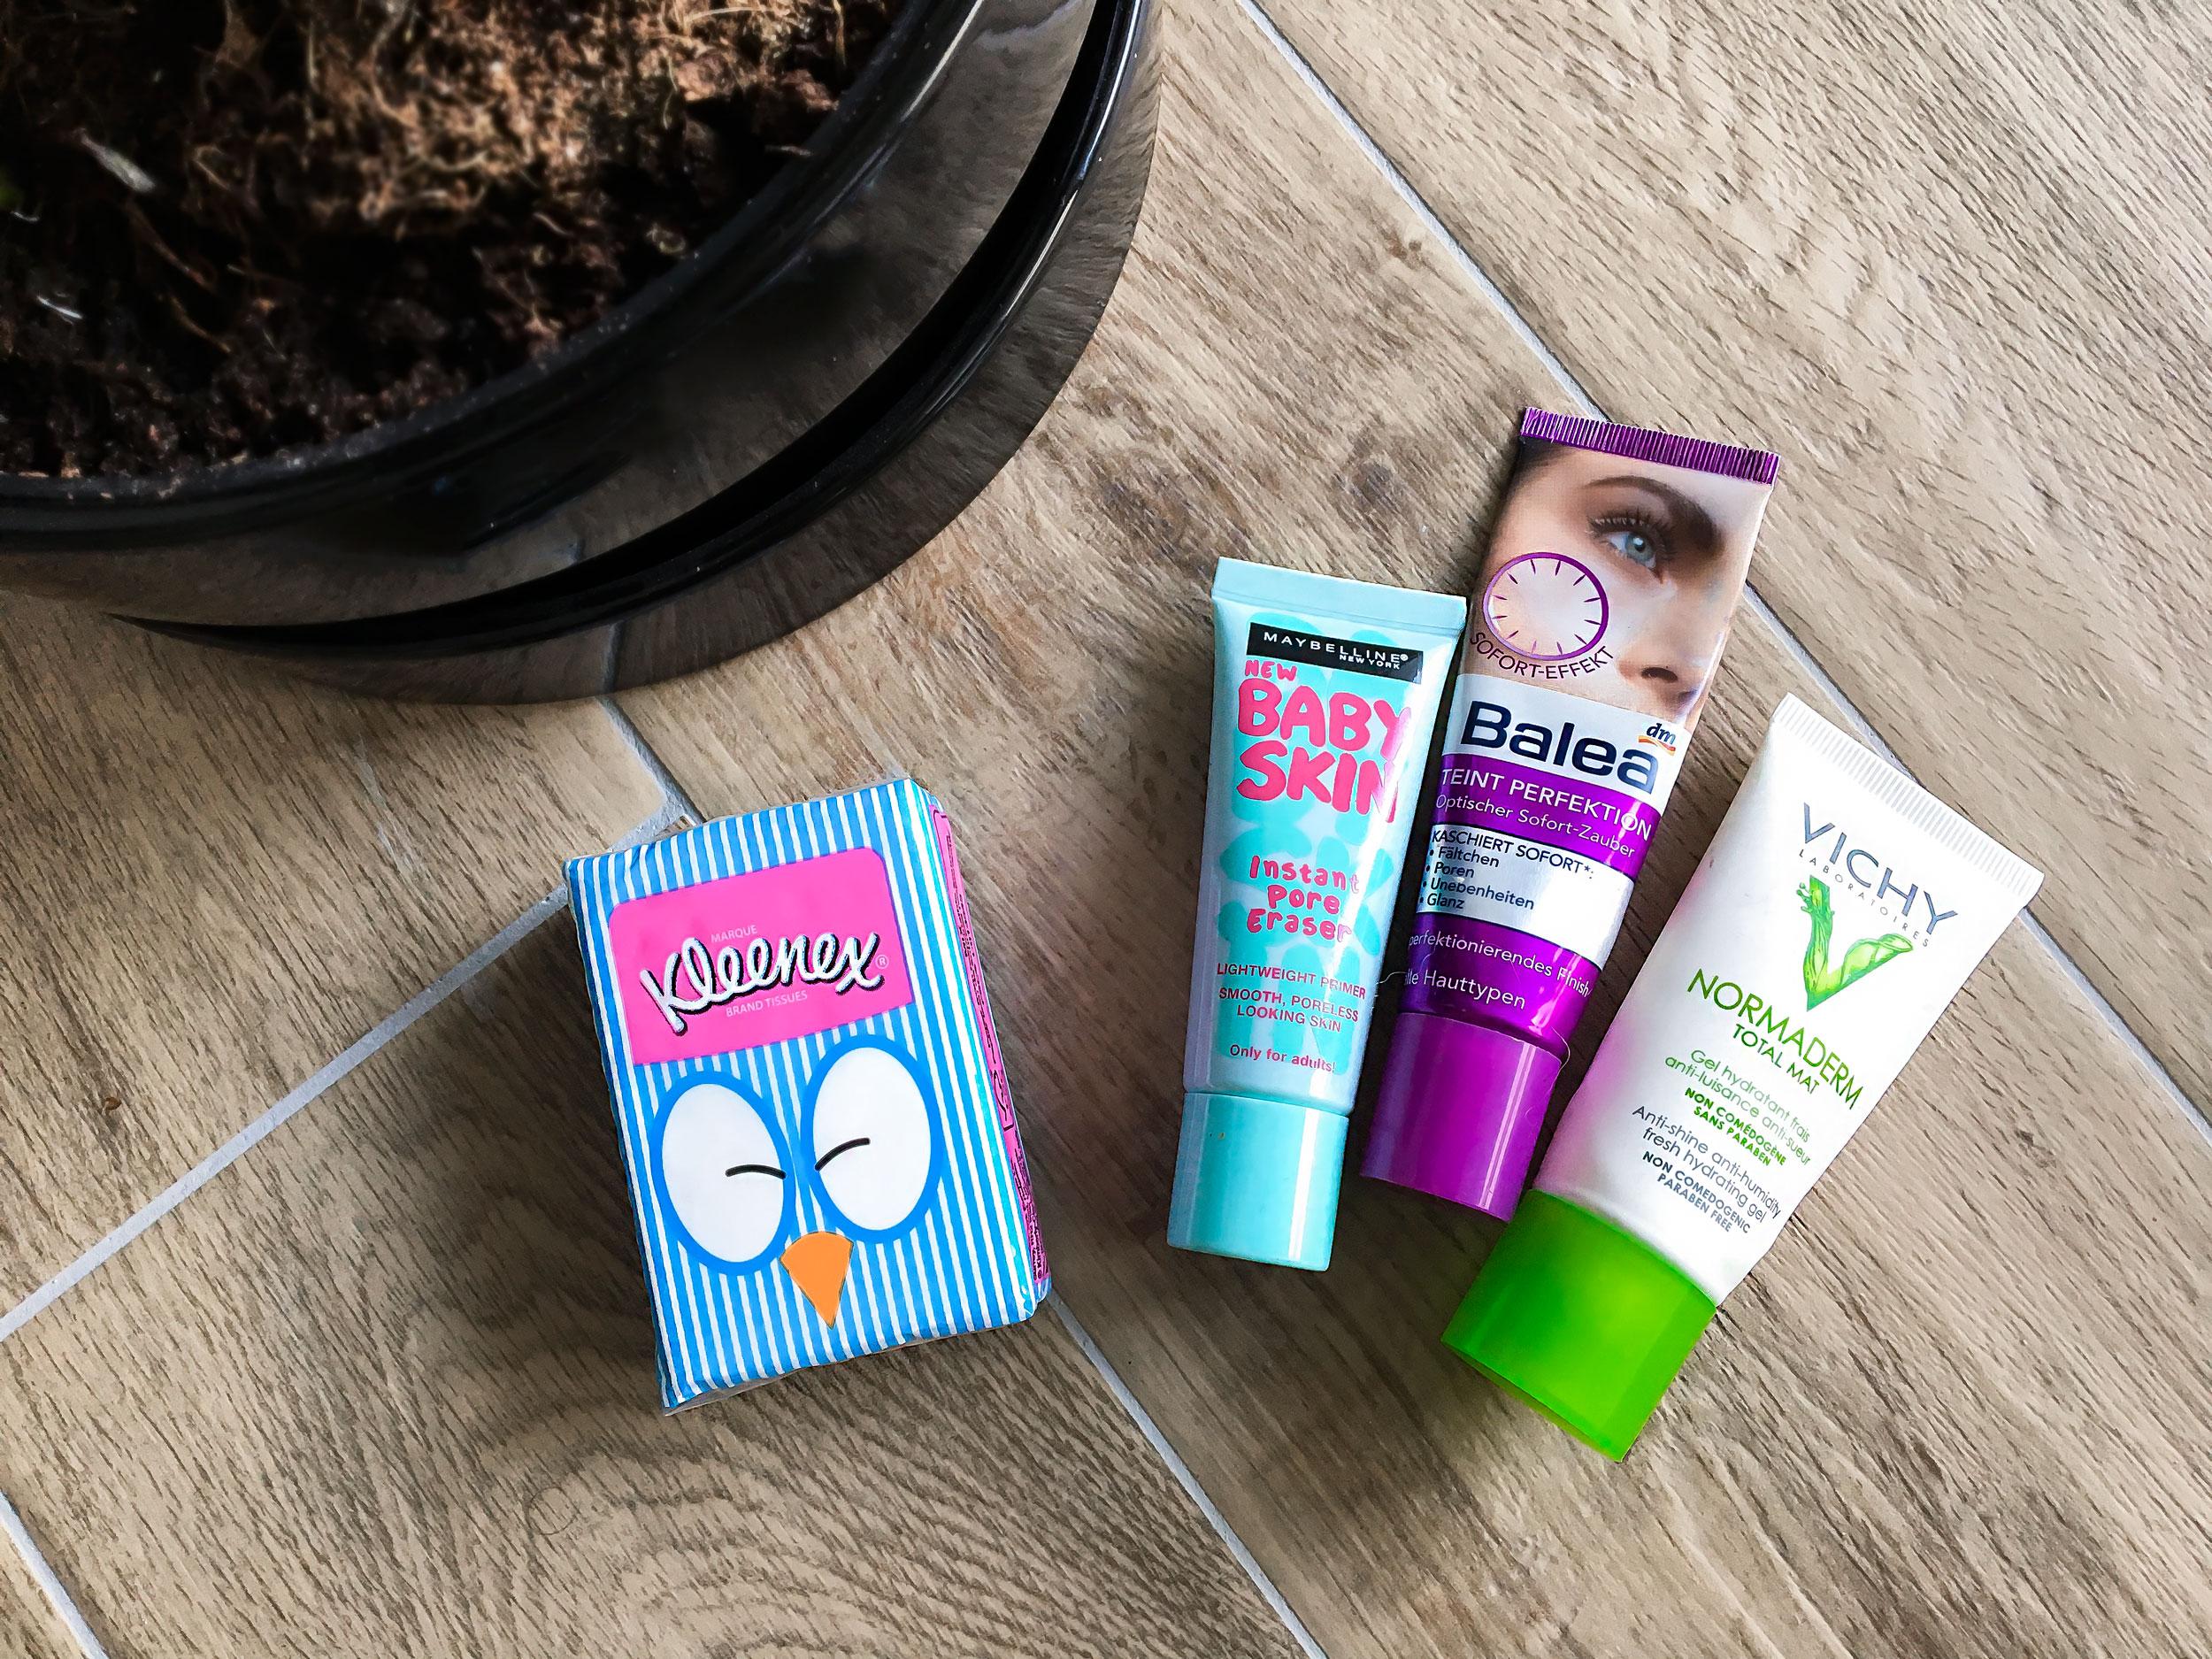 Mattifying primers and creams